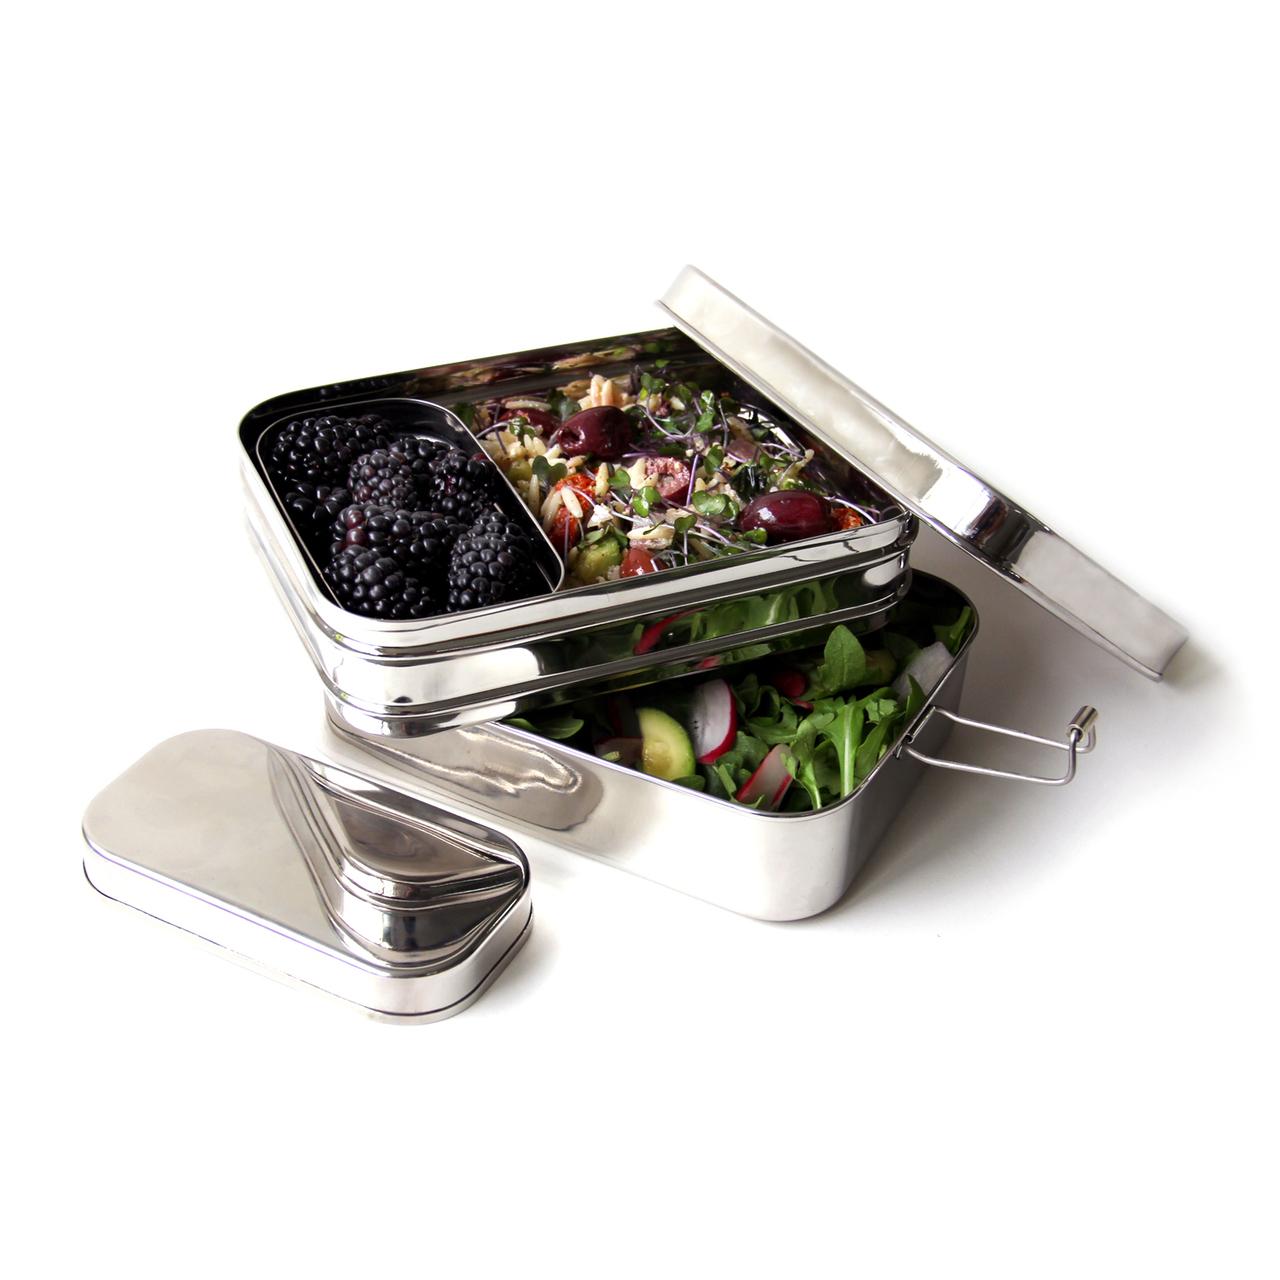 Große Lunchbox: Die Giant EcoLunchbox in Gebrauch